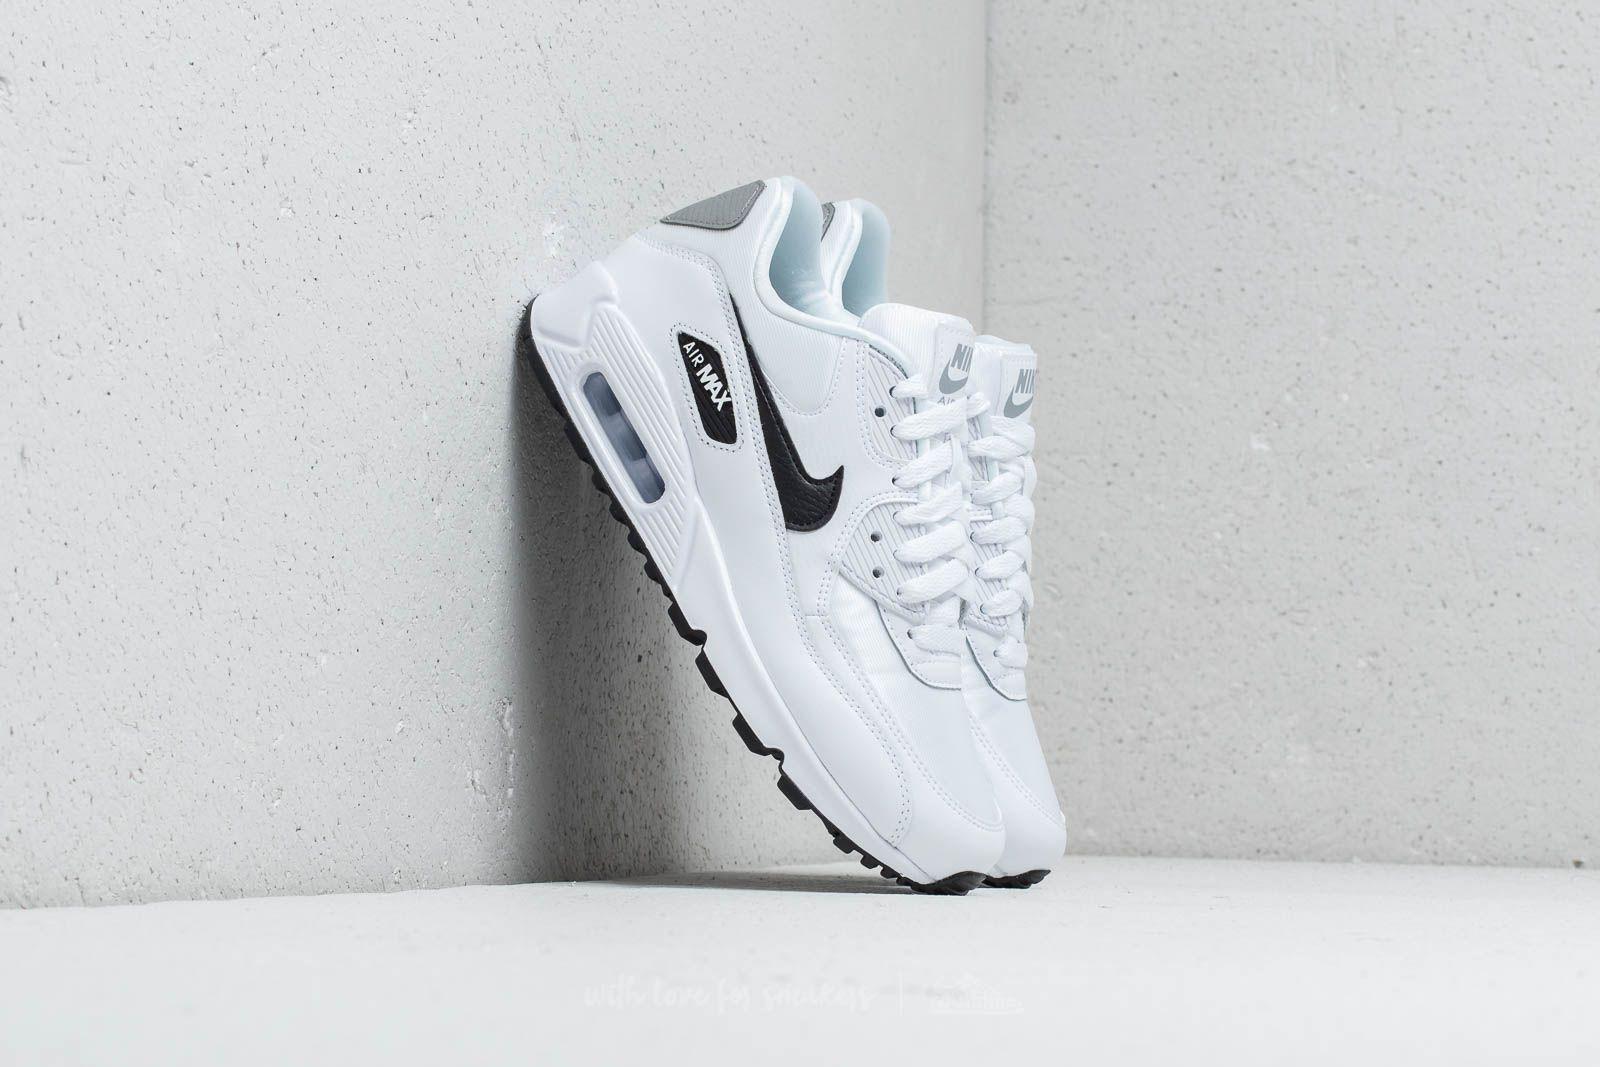 White Footshop Silver Black Max Air Reflect Wmns 90 Nike qO8I1wI 67b84ba08